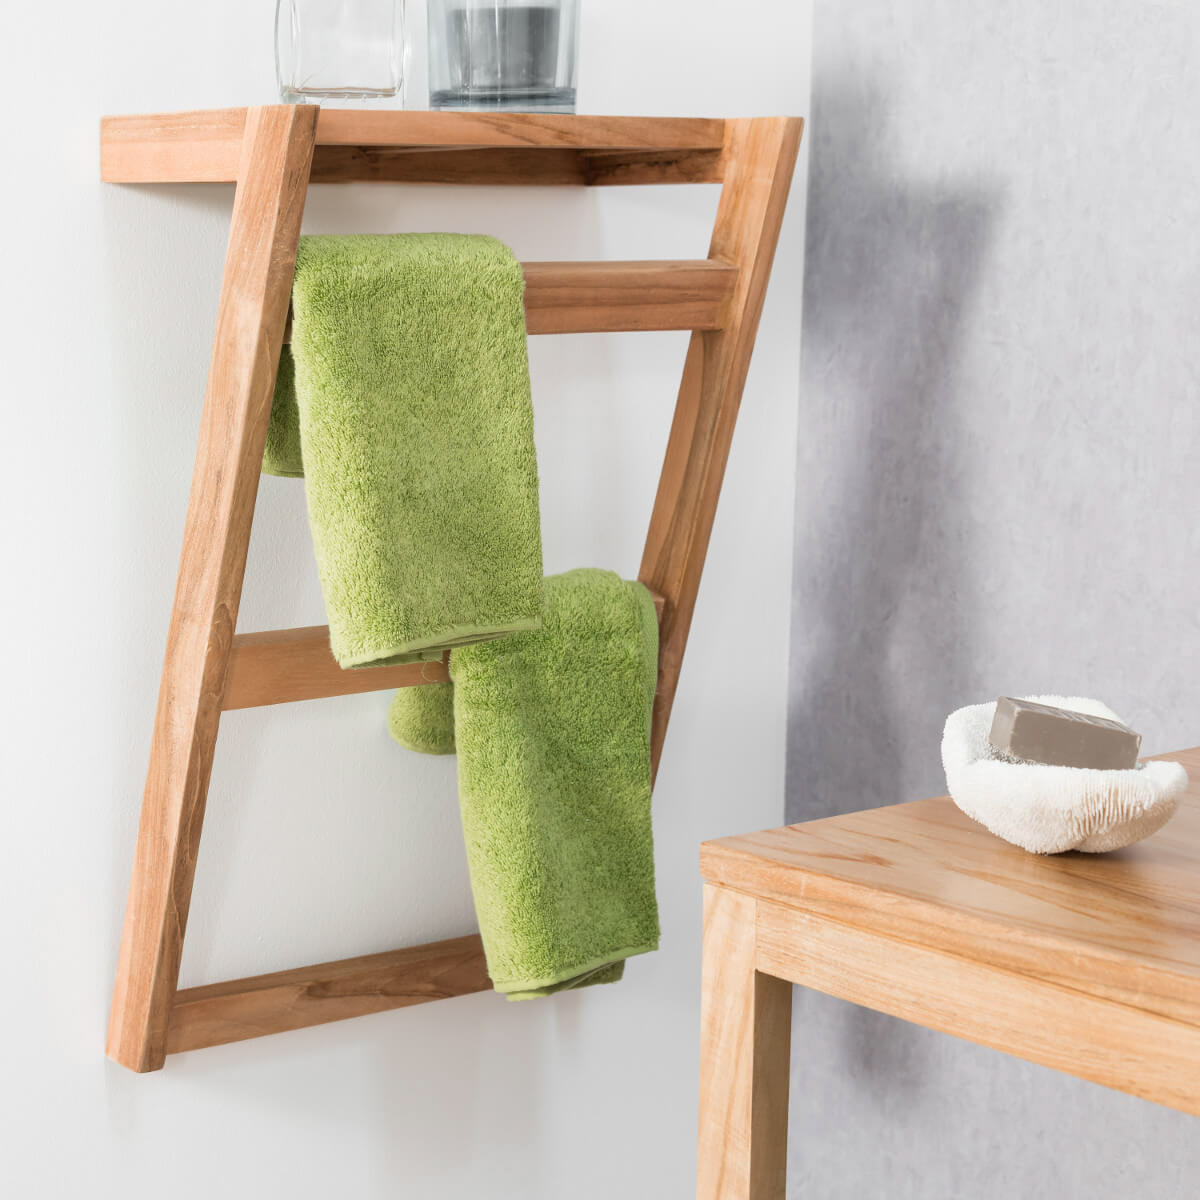 Porte serviette en teck fixer - Porte serviette salle de bain mural ...